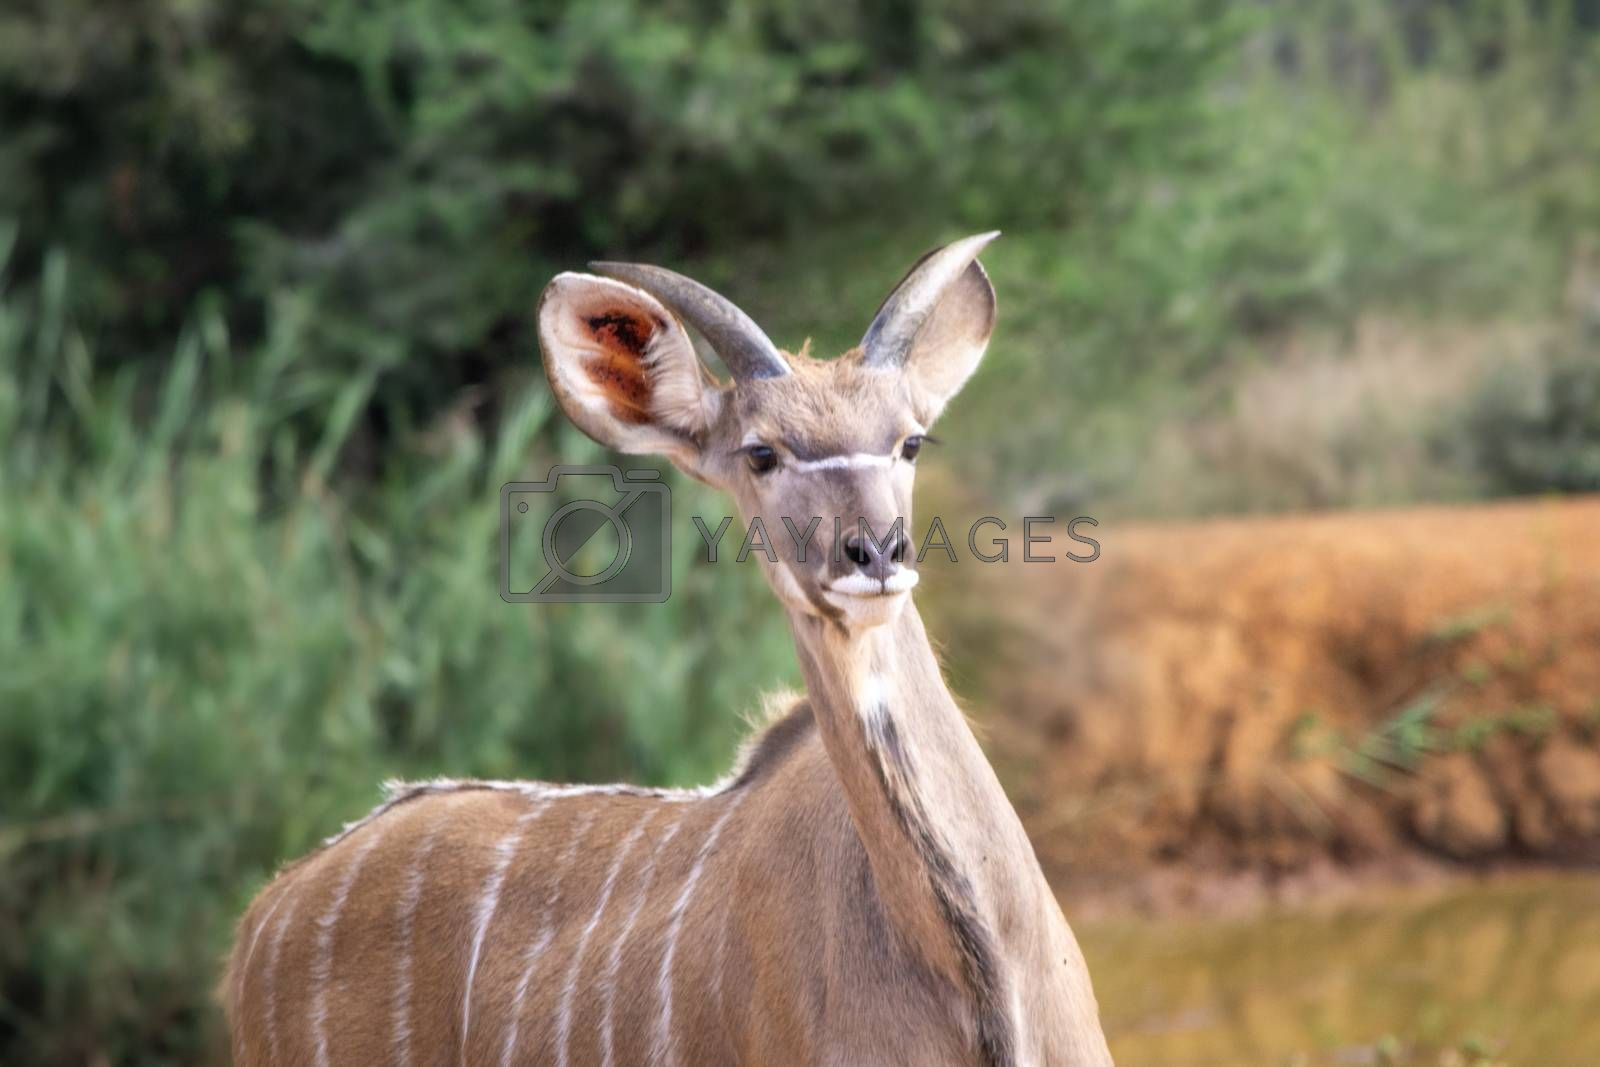 Juvenile Greater Kudu or Tragelaphus strepsiceros alerted in the African savannah. Safari animal.